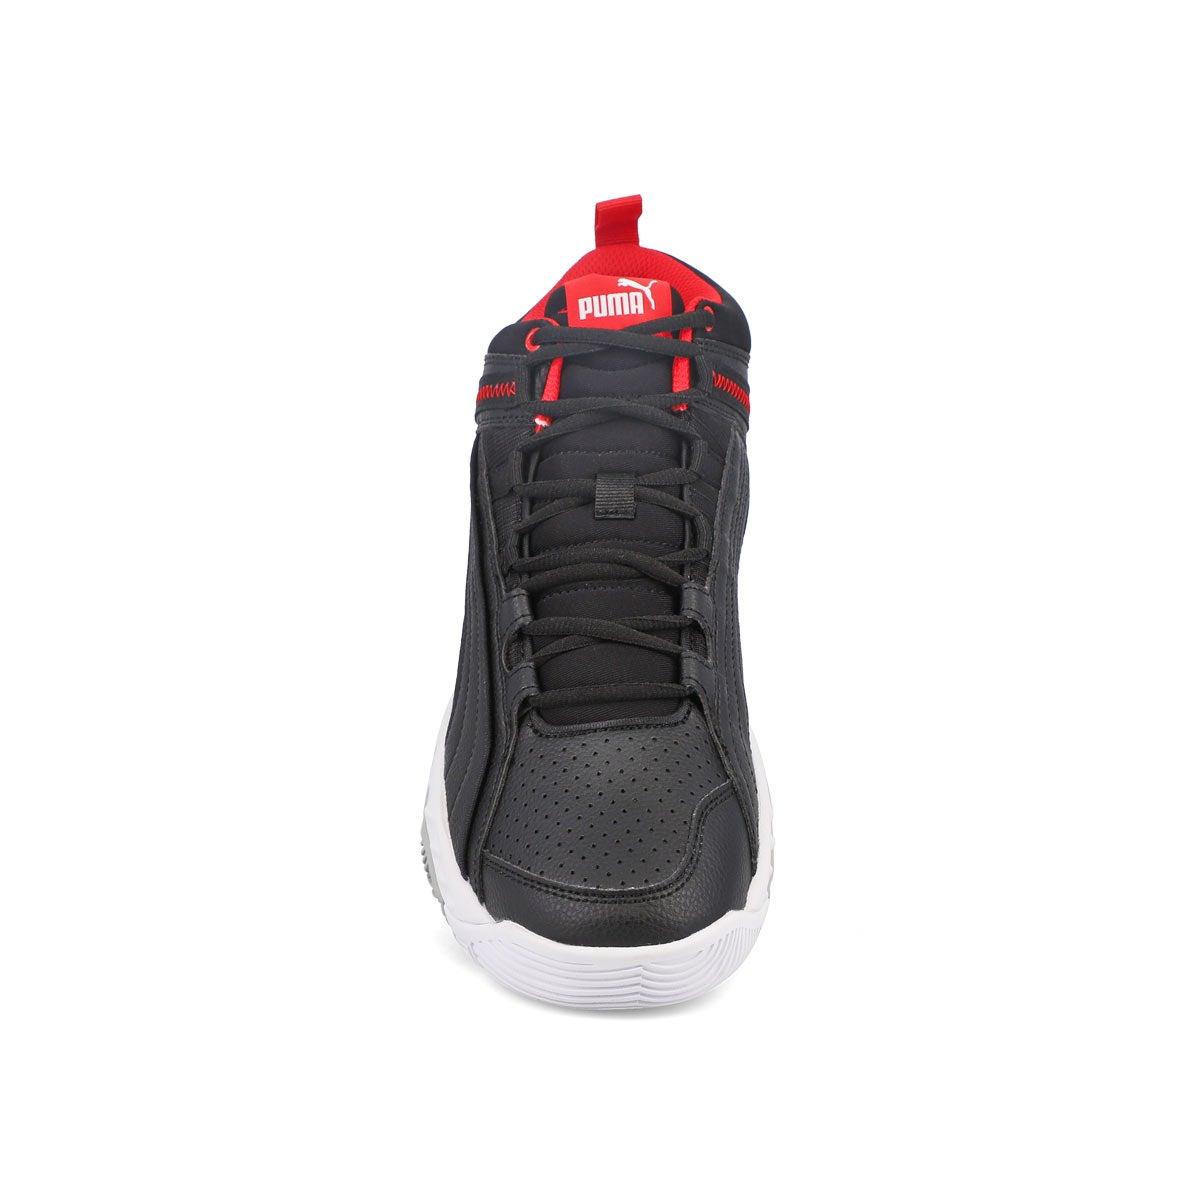 Men's Rebound Future EVO Sneaker - Black/White